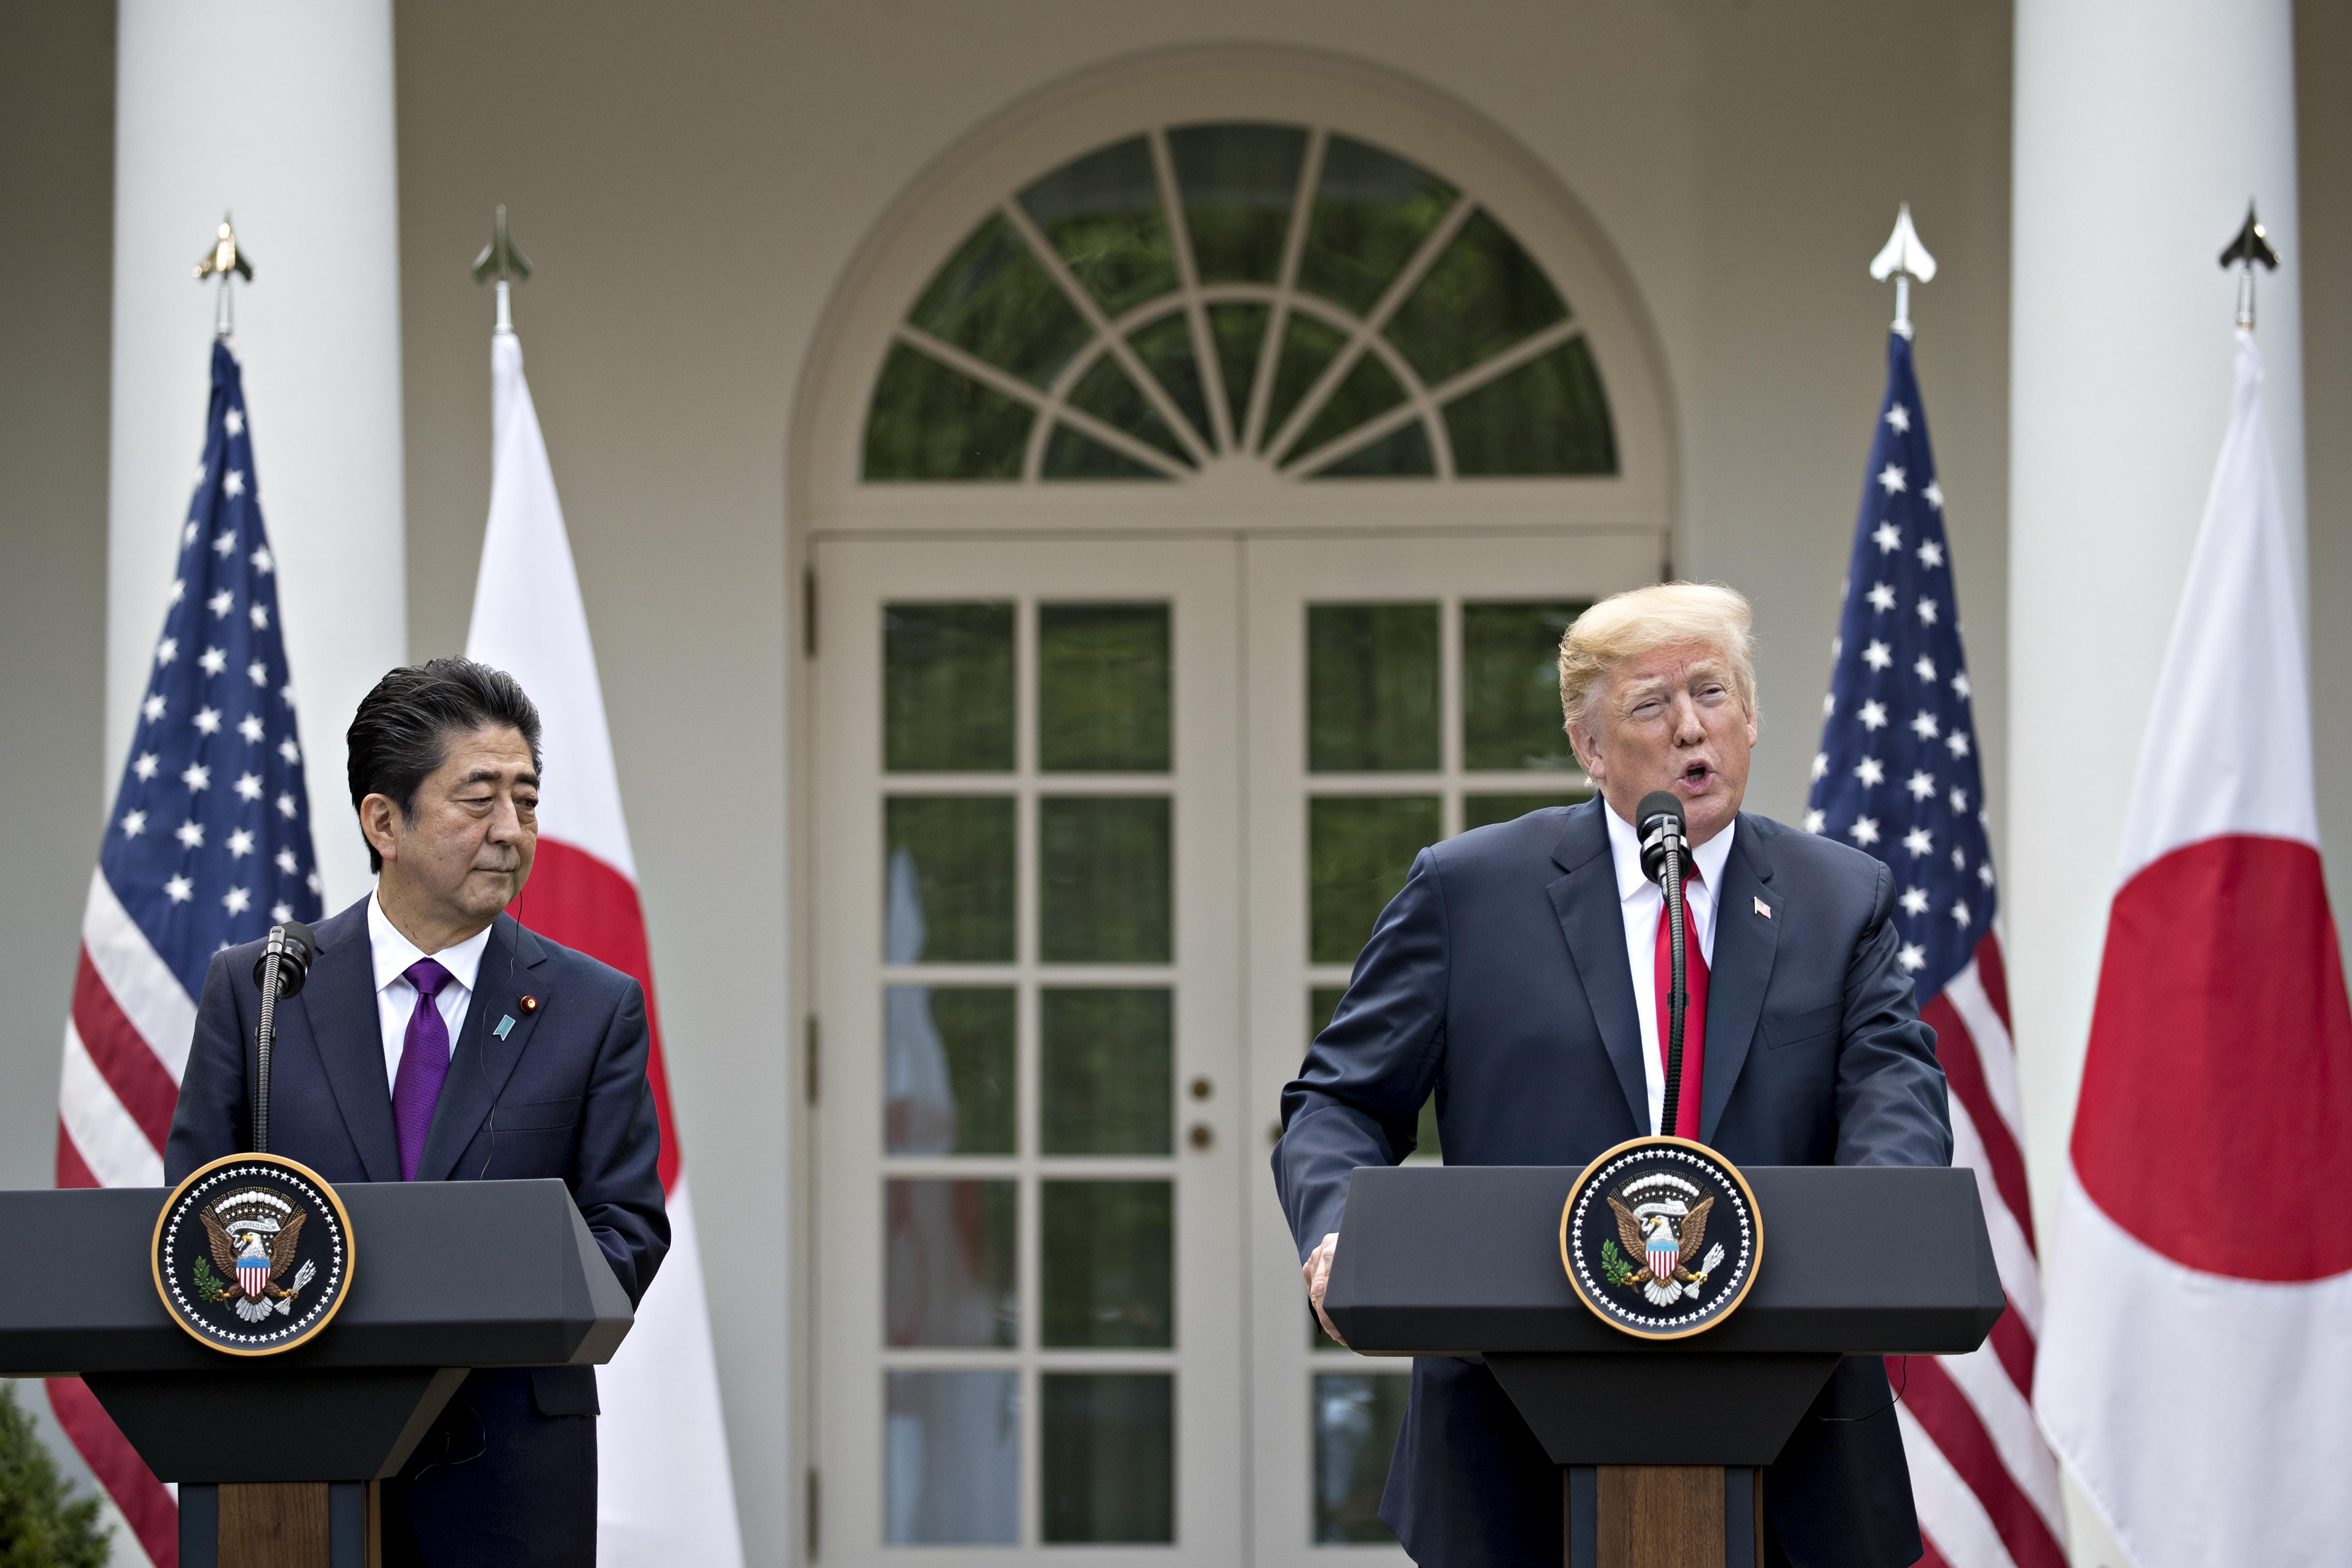 President Donald Trump speaks as Shinzo Abe, Japan's prime minister, left, listens in the Rose Garden of the White House in Washington on June 7, 2018. MUST CREDIT: Bloomberg photo by Andrew Harrer.